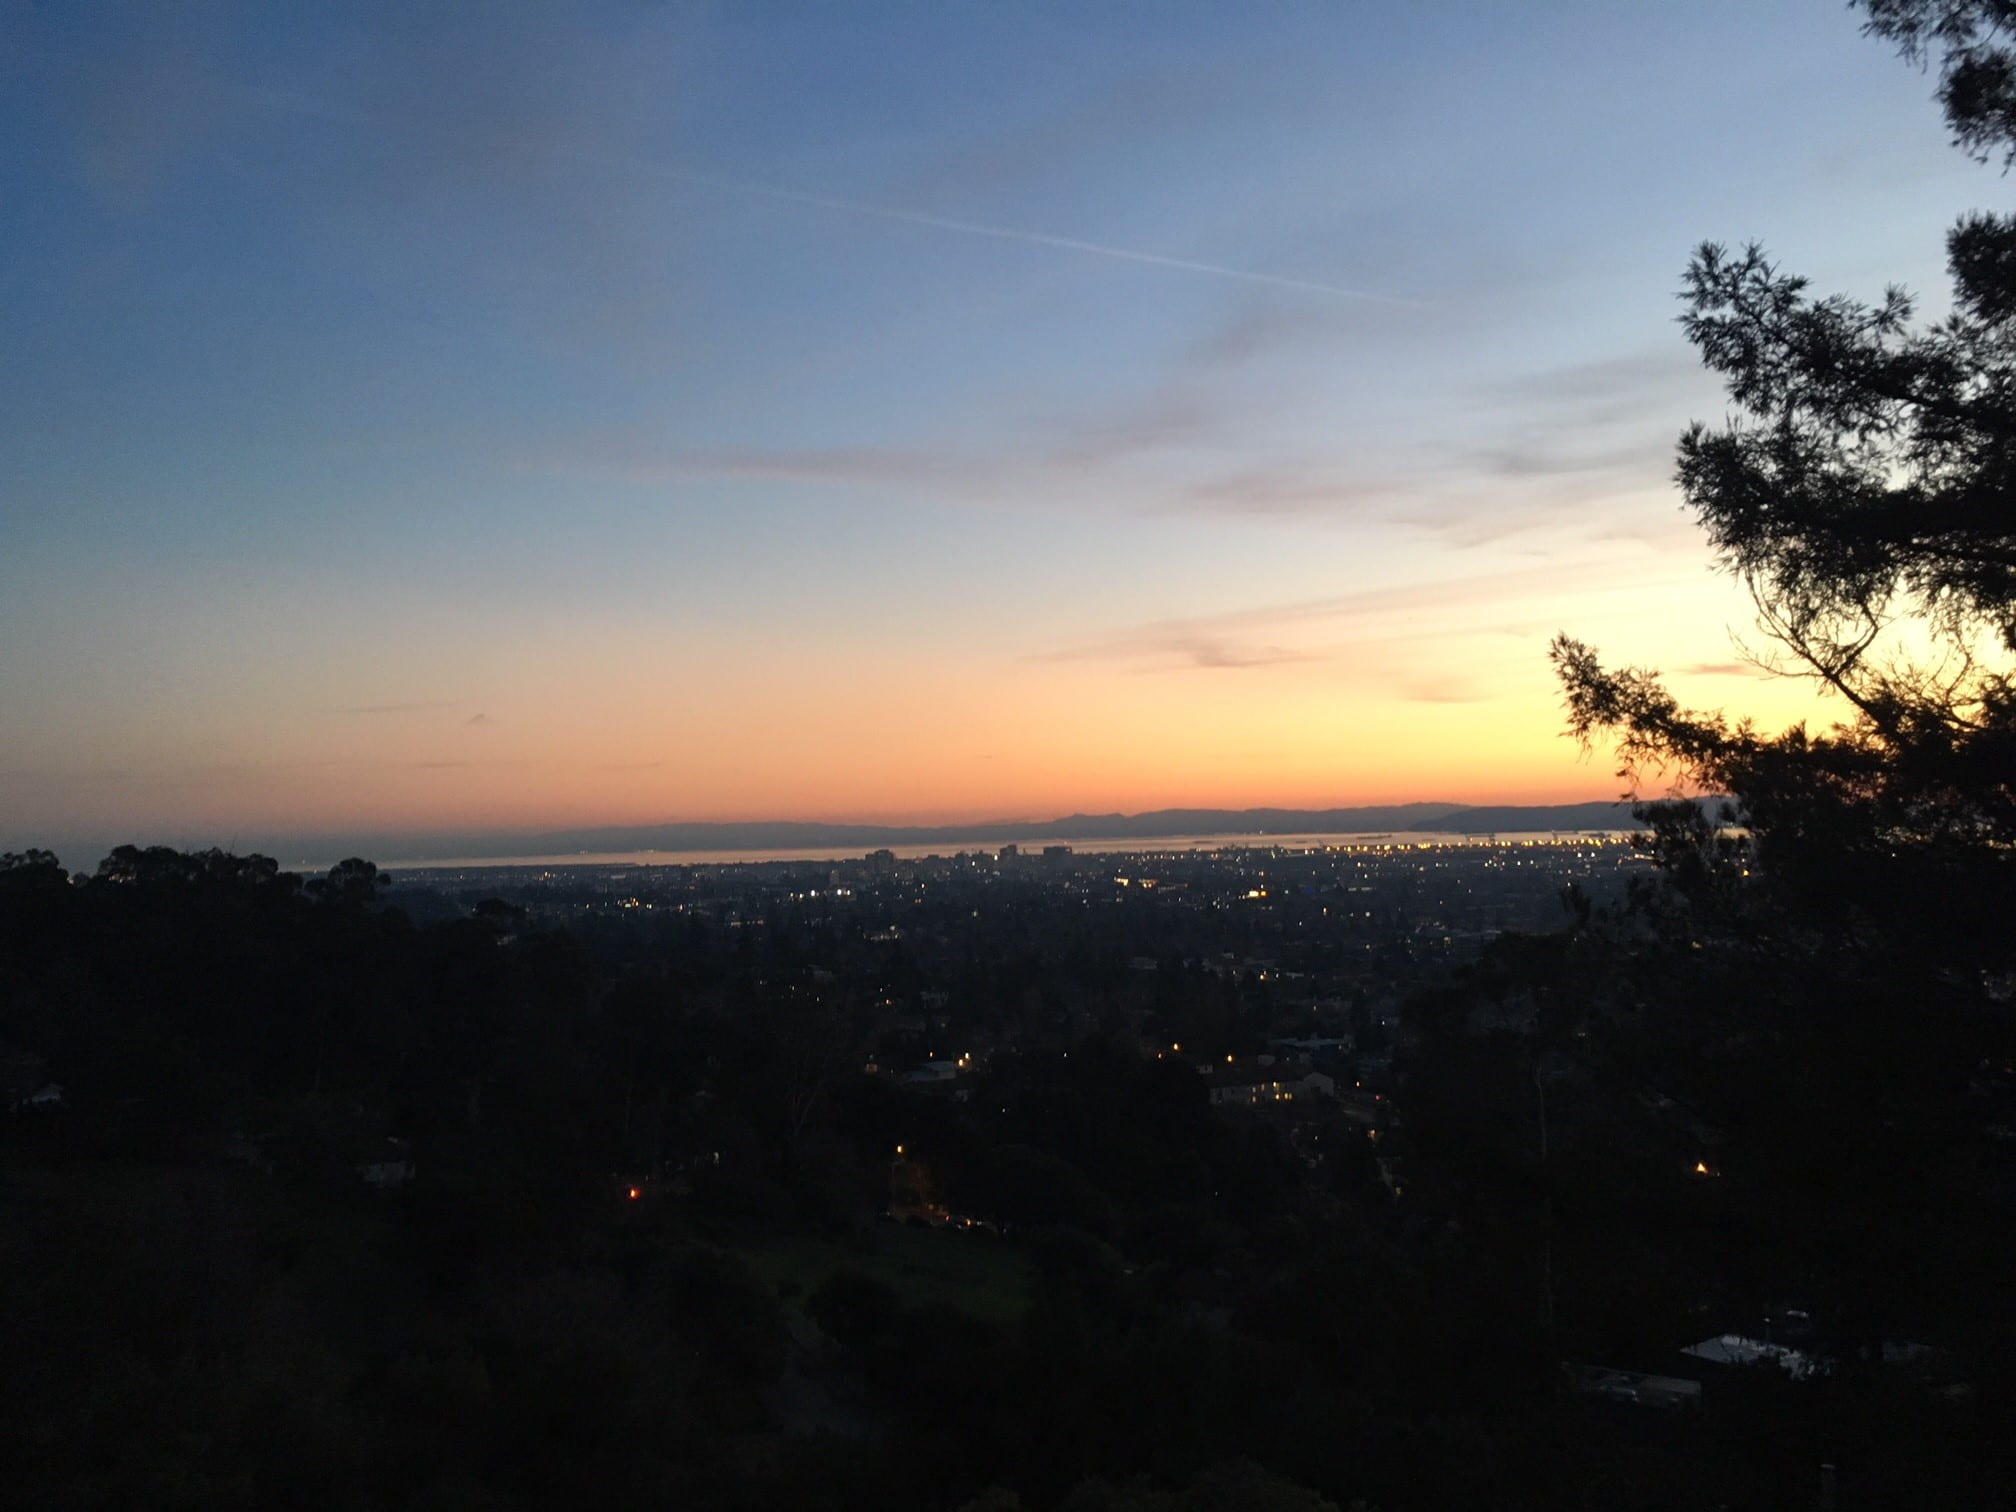 Sunset over Berkeley